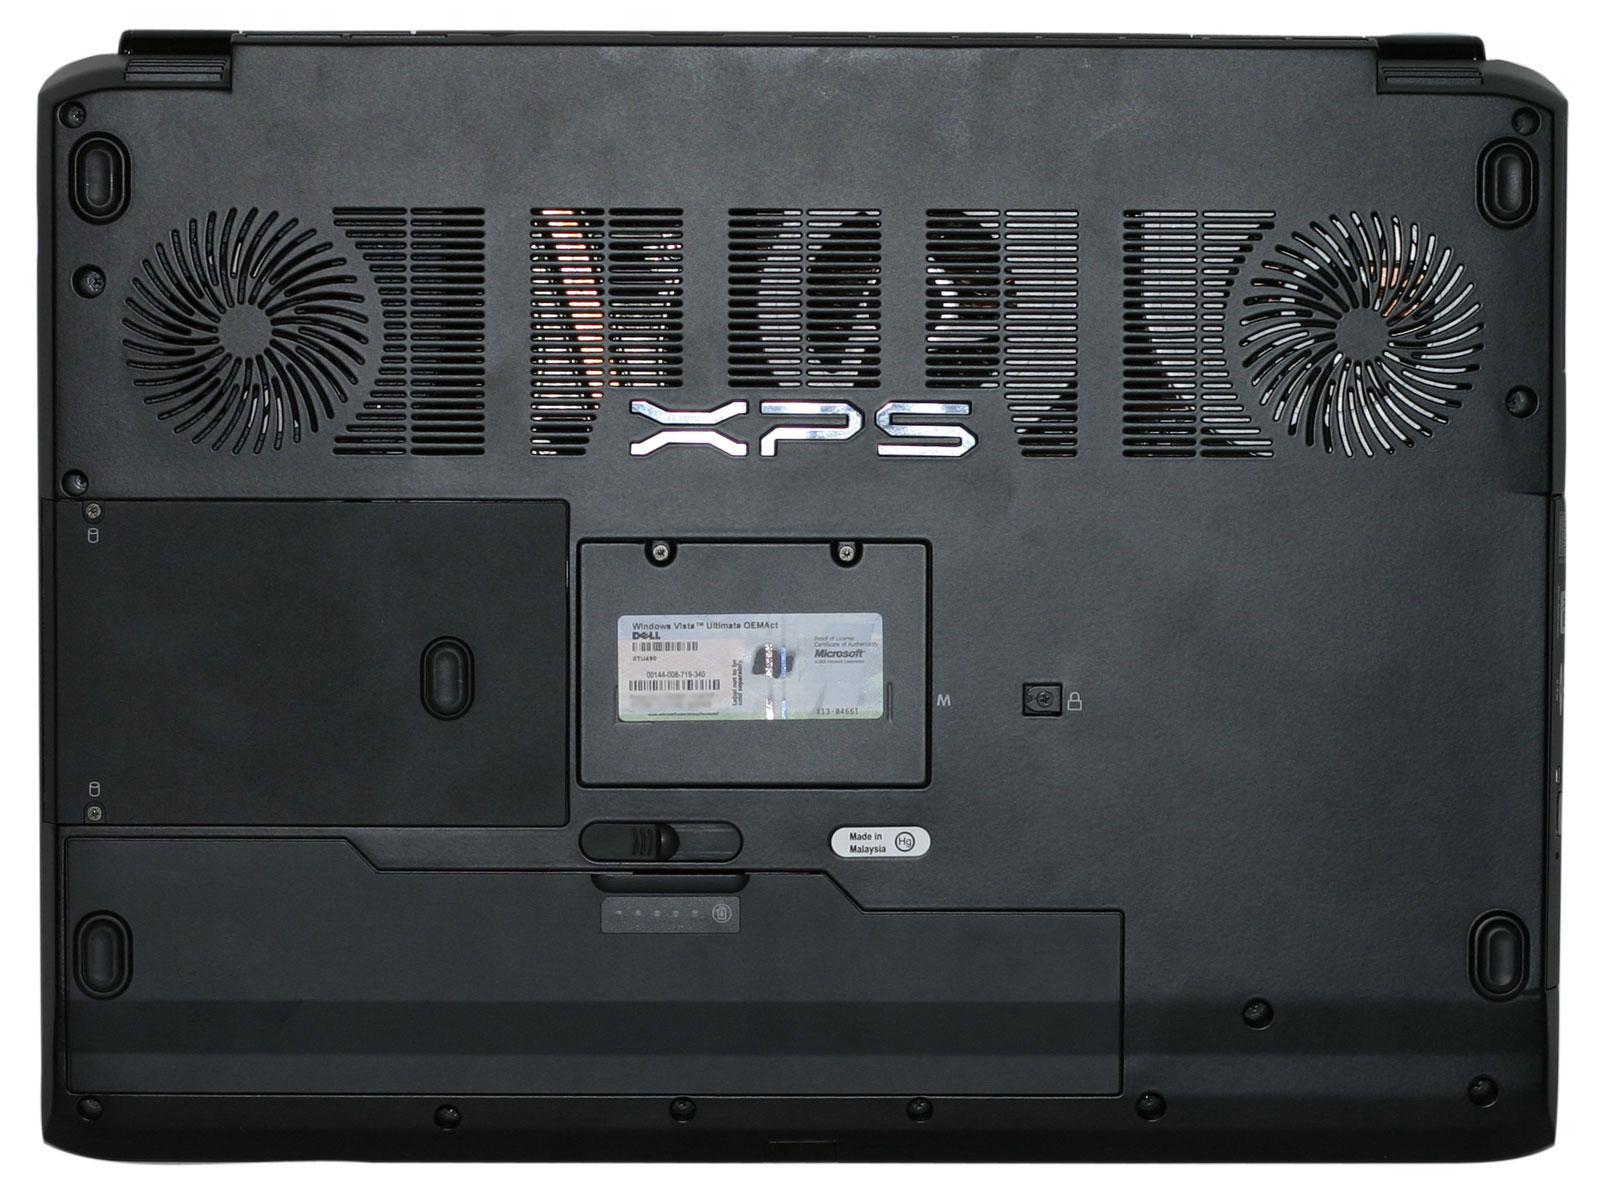 Dell inspiron 15r n5110 web camera